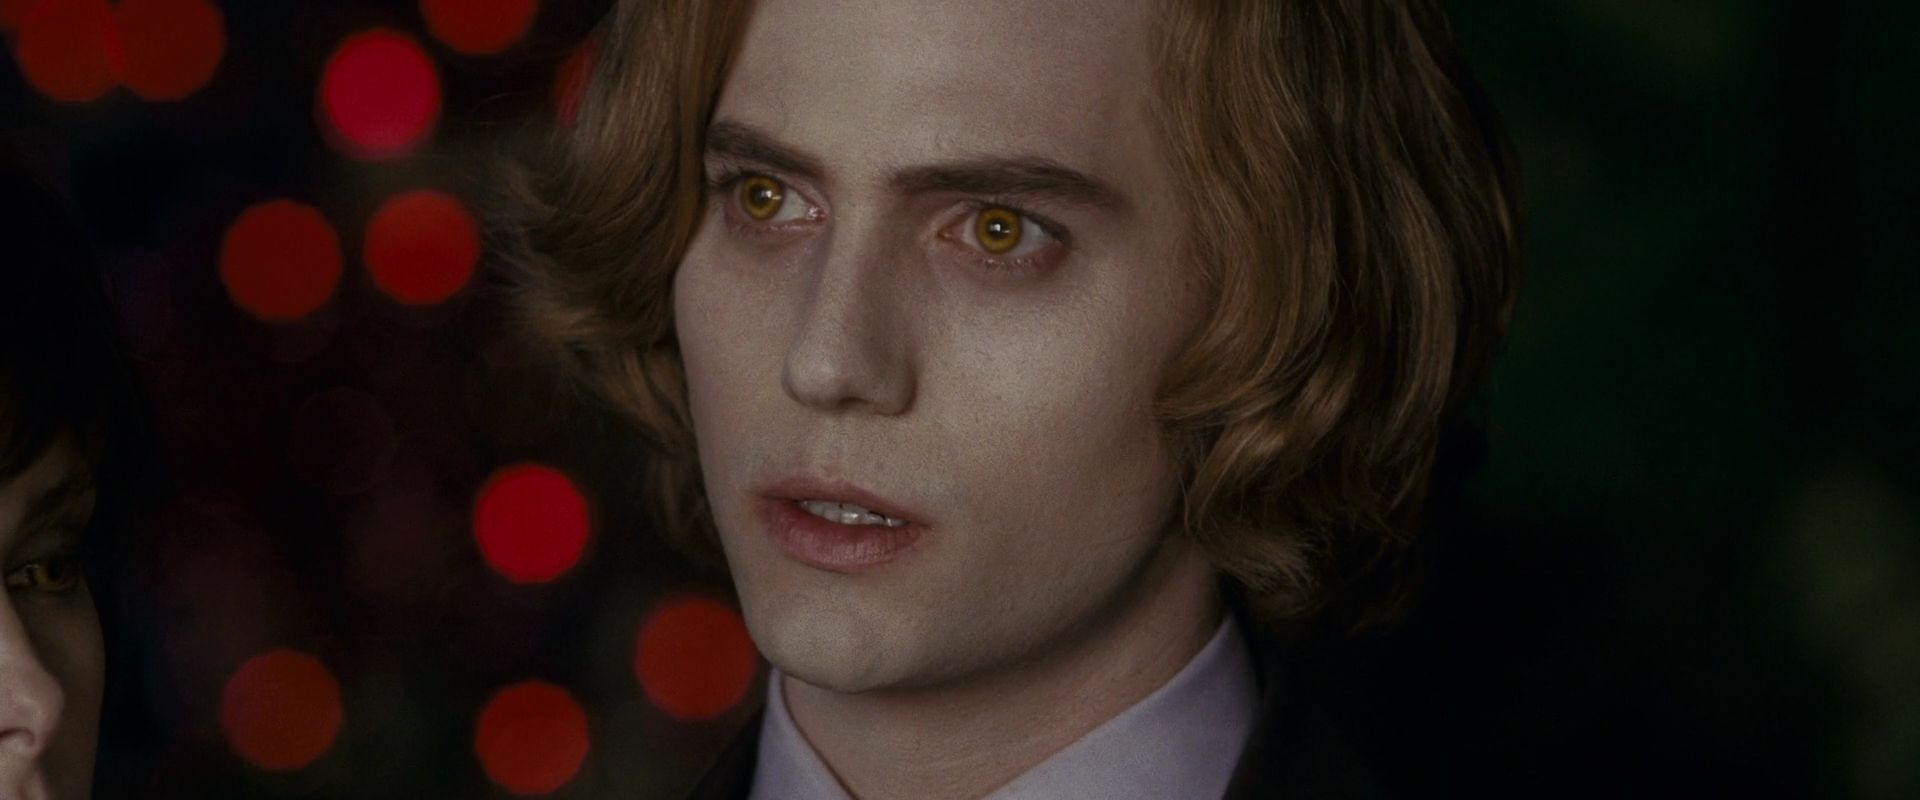 Pictures of jasper cullen Category:Images of Jasper Hale Twilight Saga Wiki FANDOM